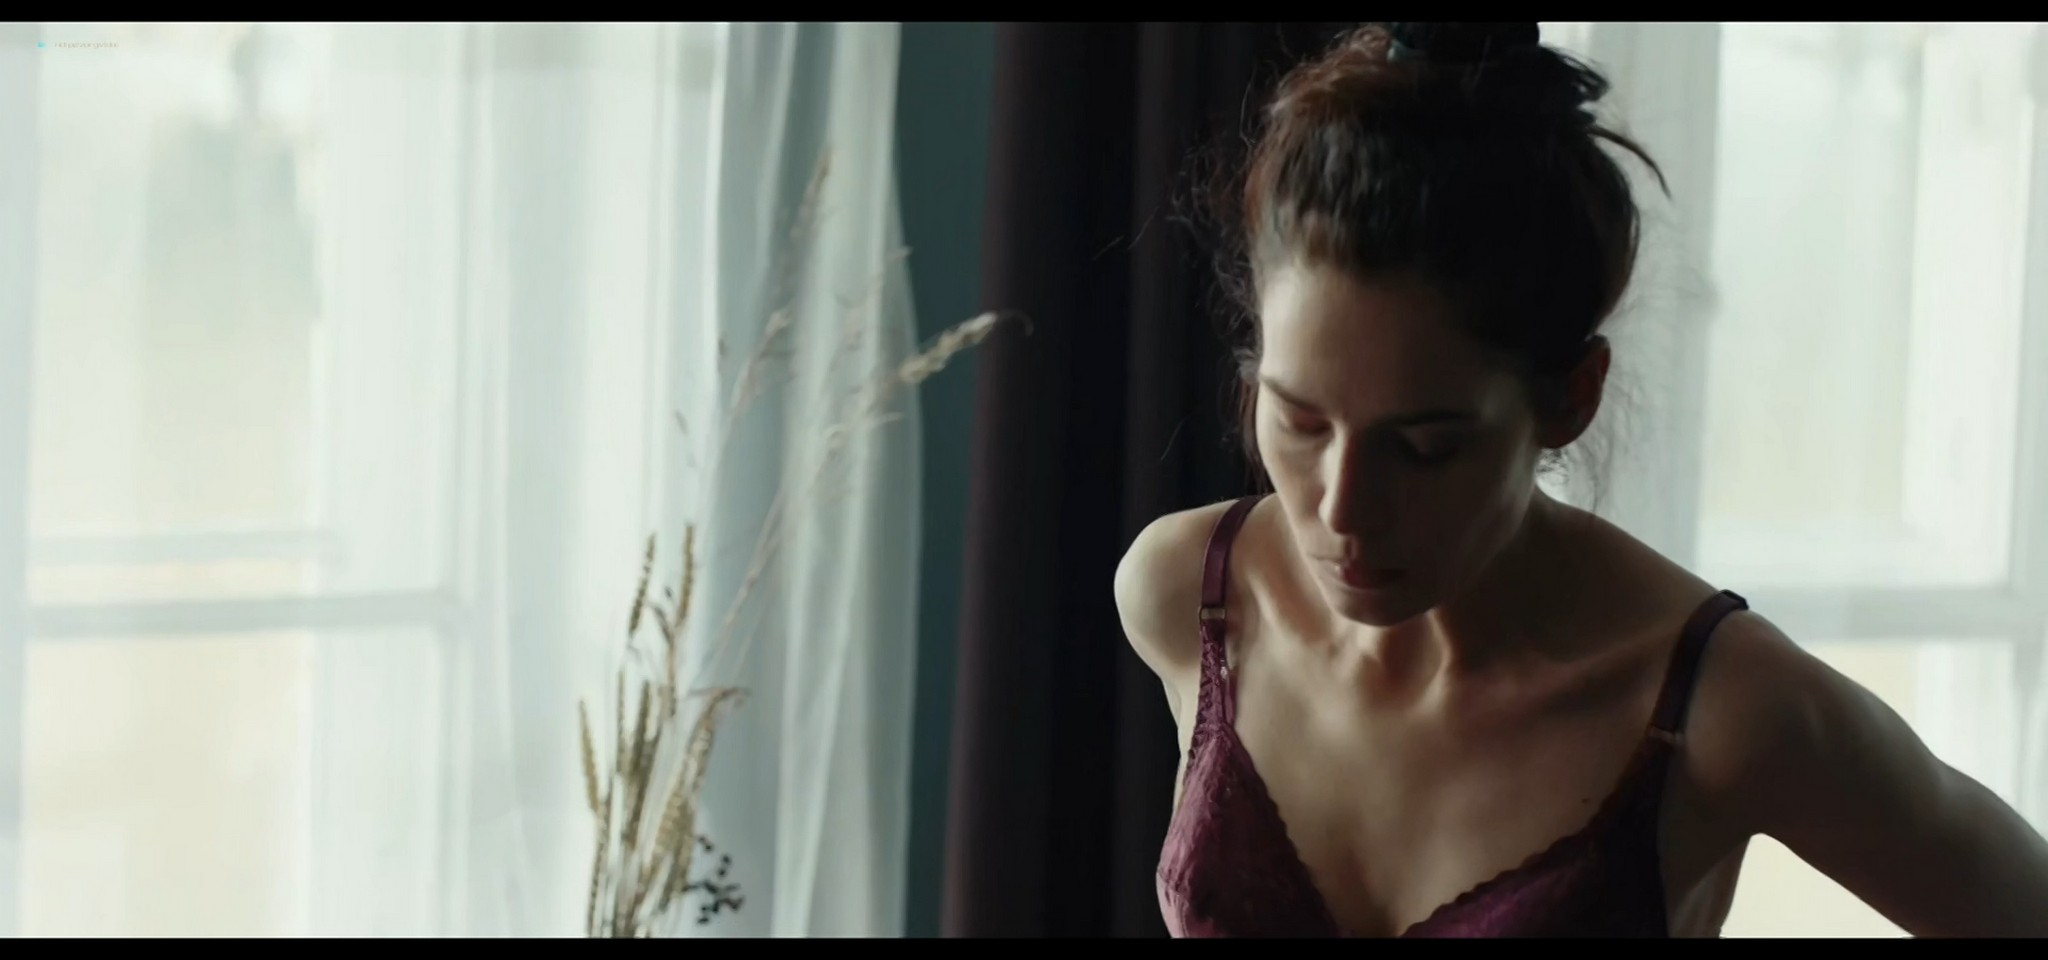 Yulia Snigir hot and some sex Anna Chipovskaya, Yuliya Peresild sexy - The End of the Season (2019) HD 1080p Web (7)